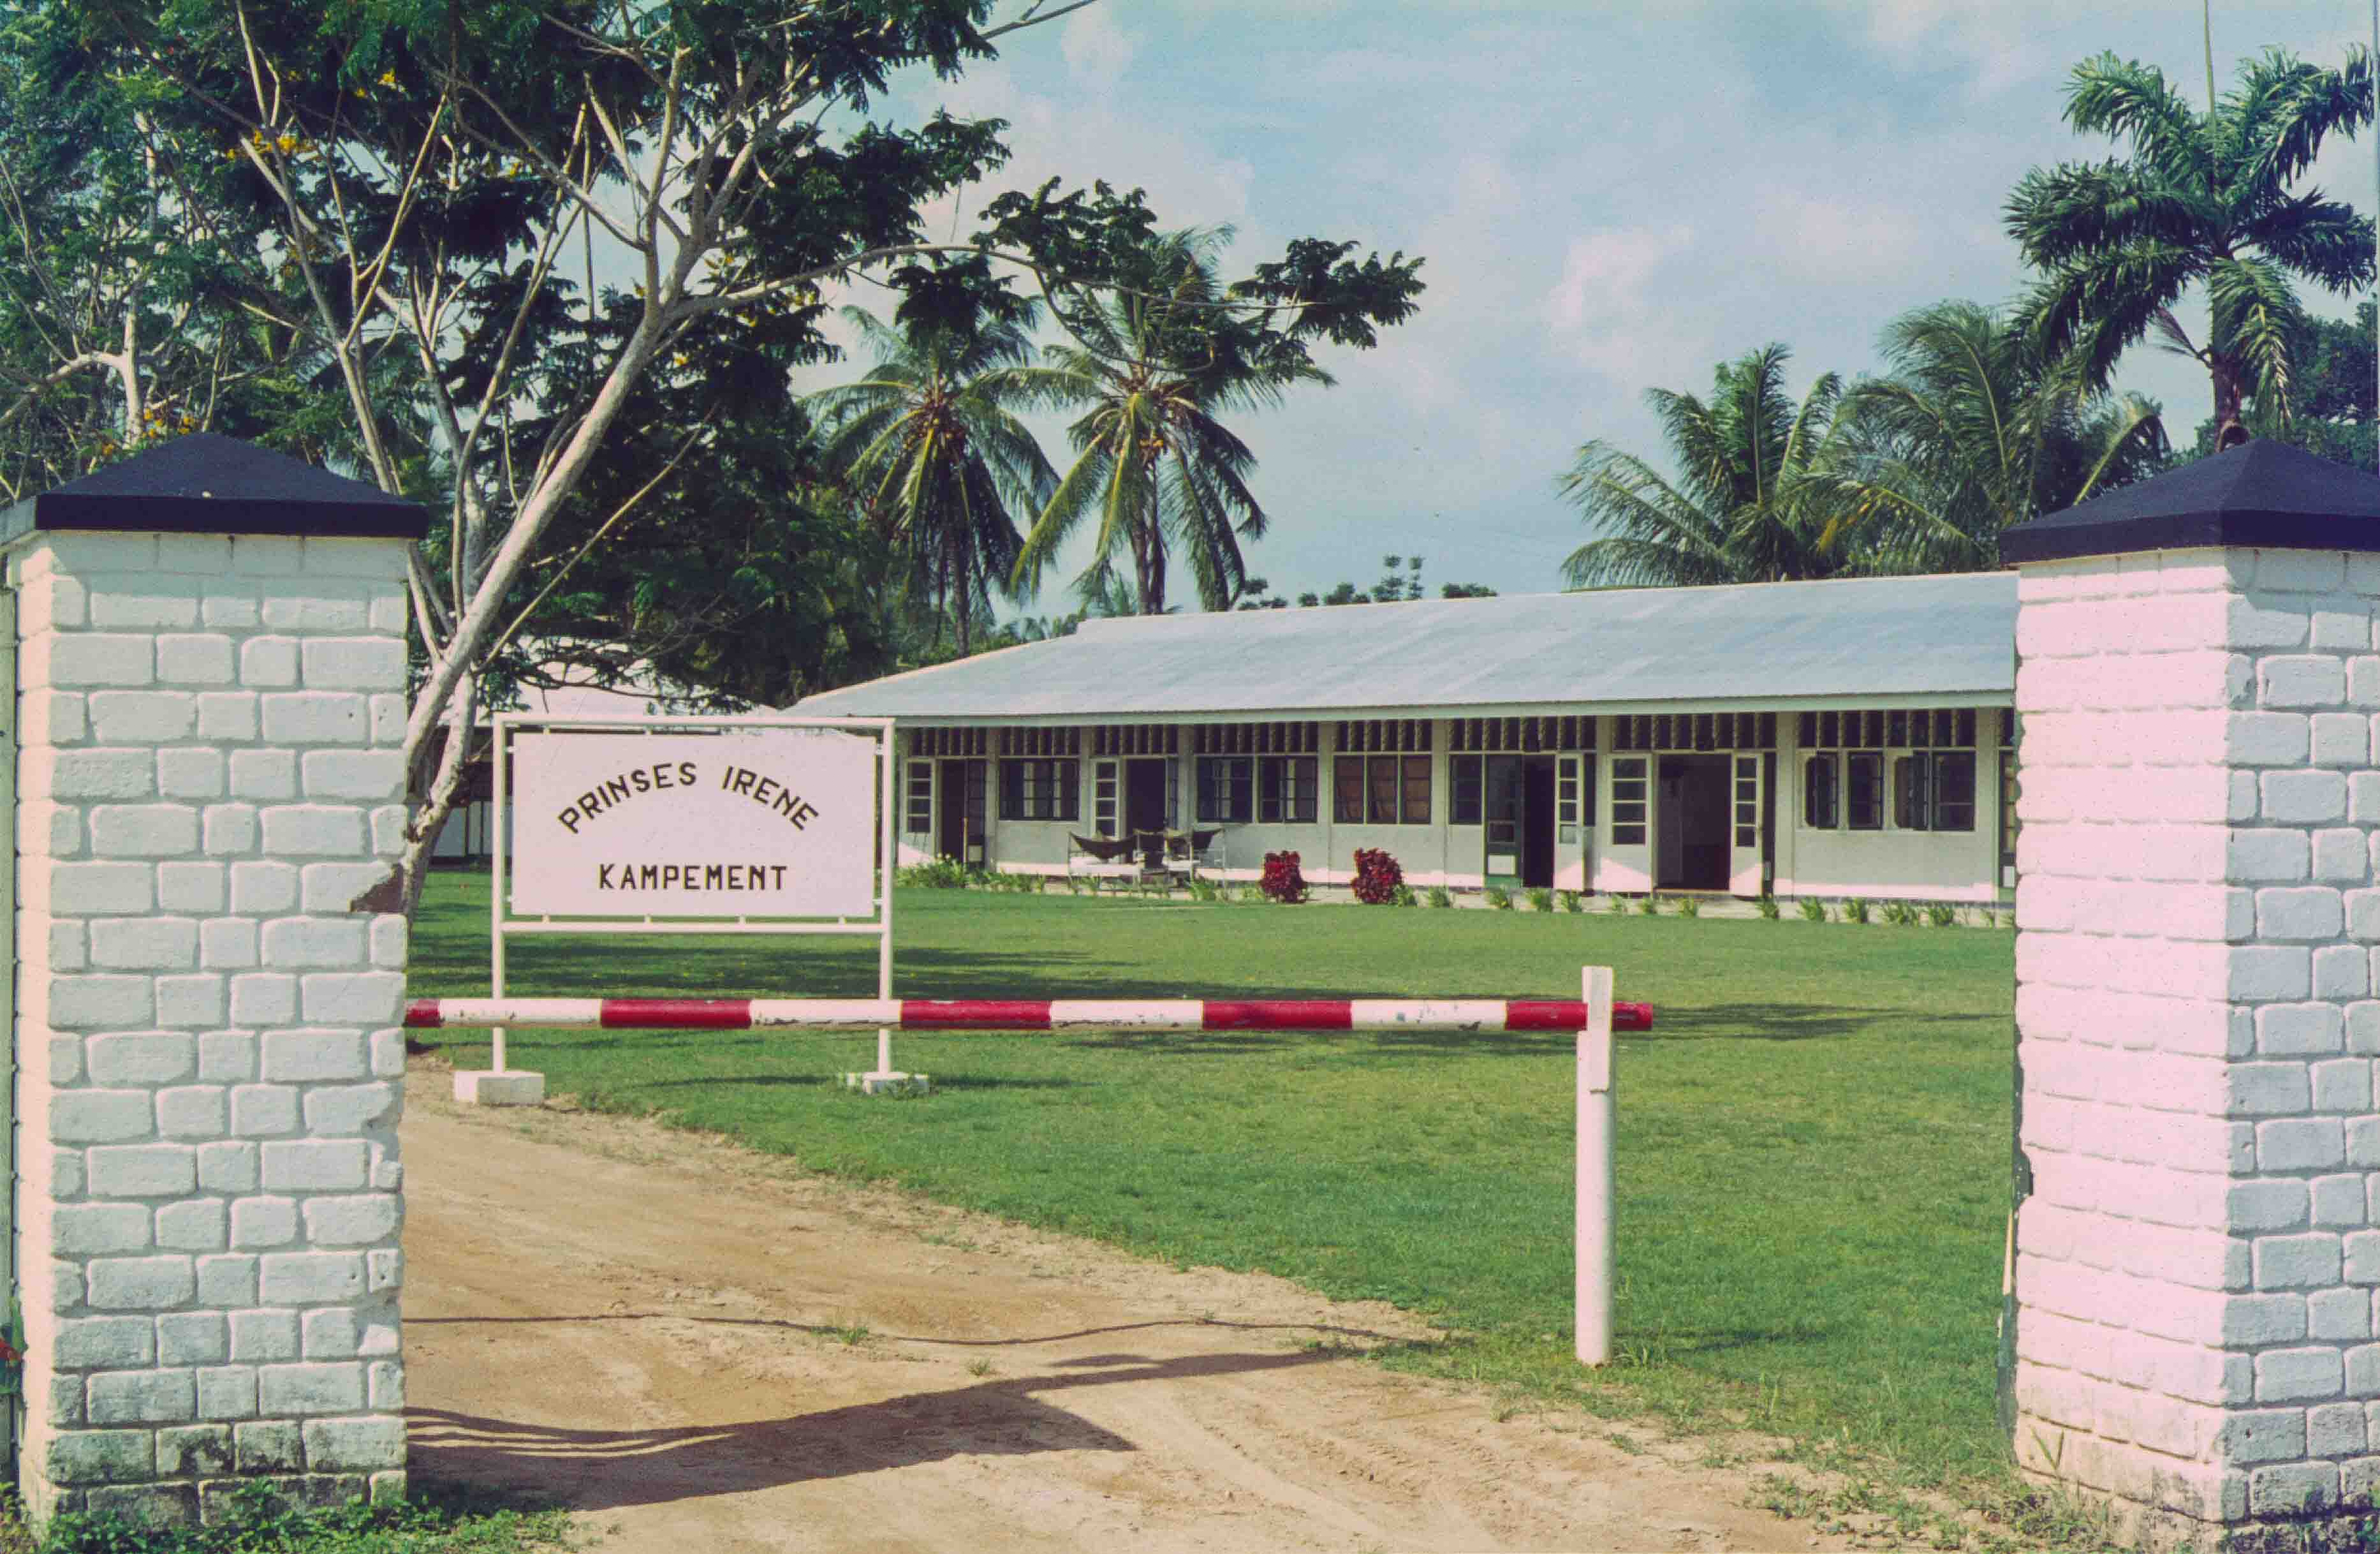 329. Suriname